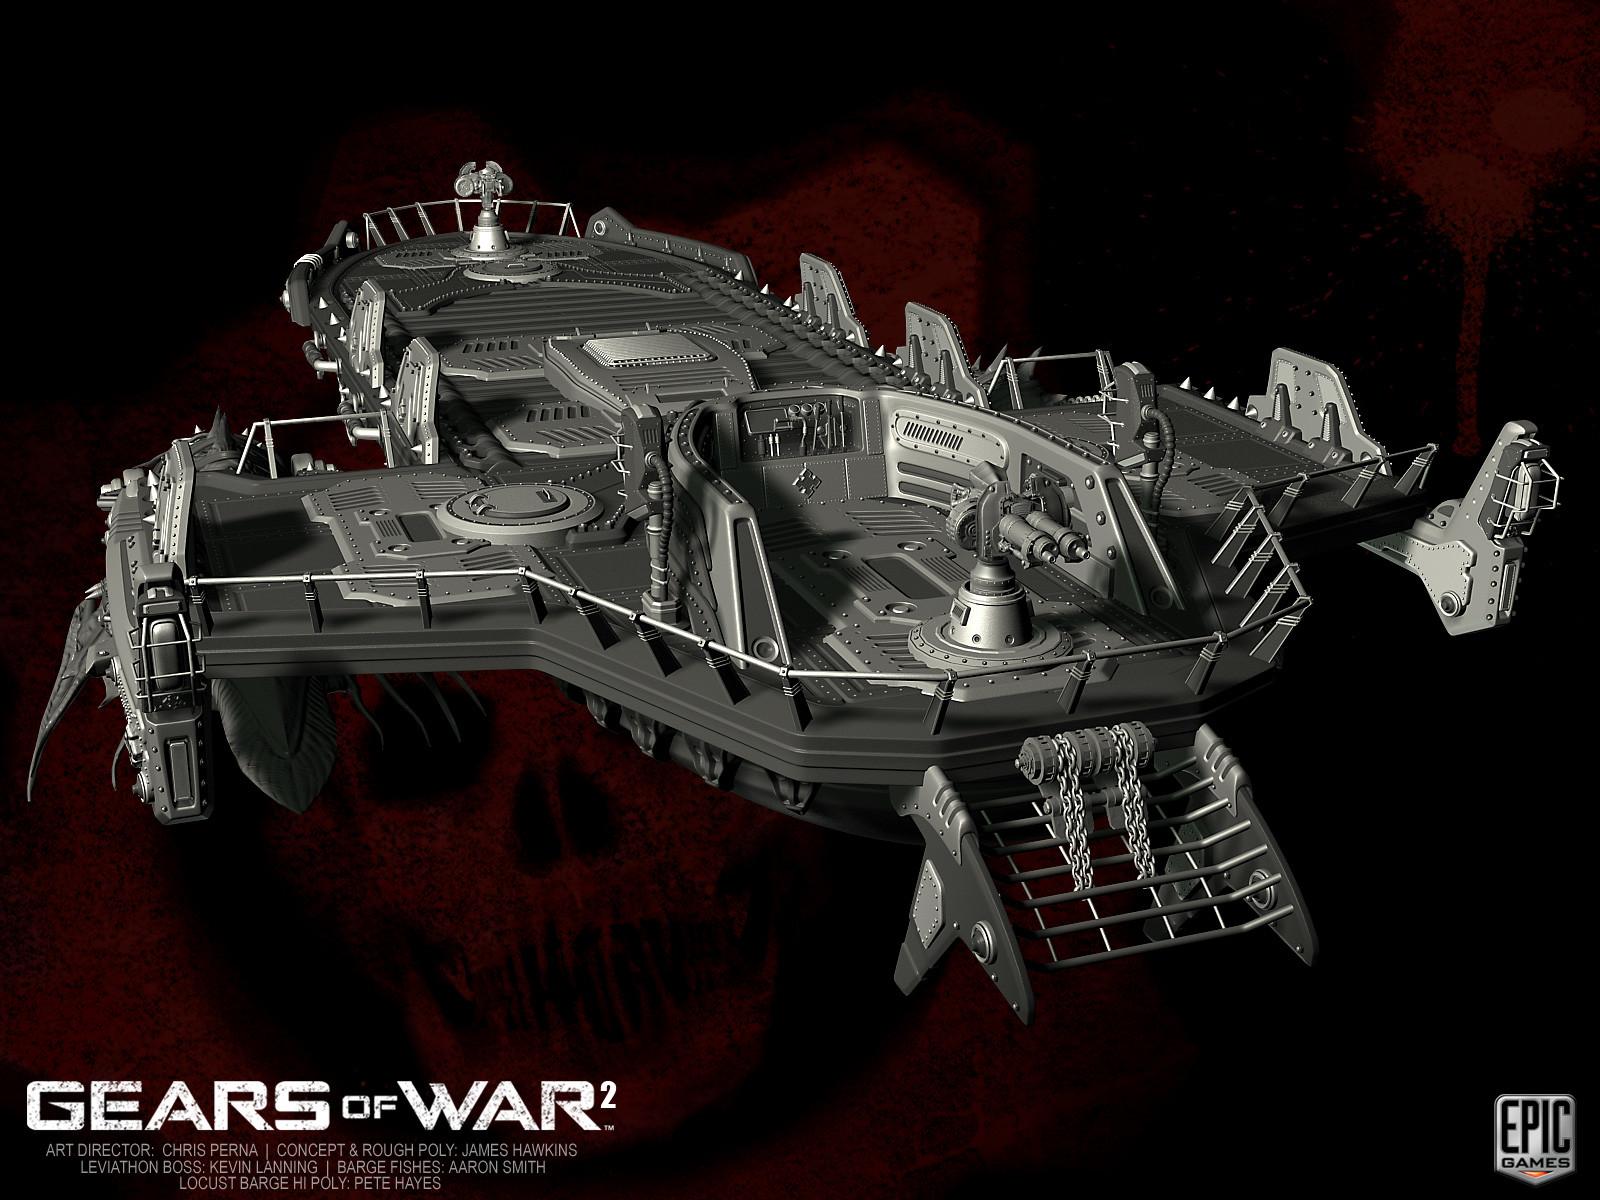 Pete Hayes - Gears of War 2 Vehicles